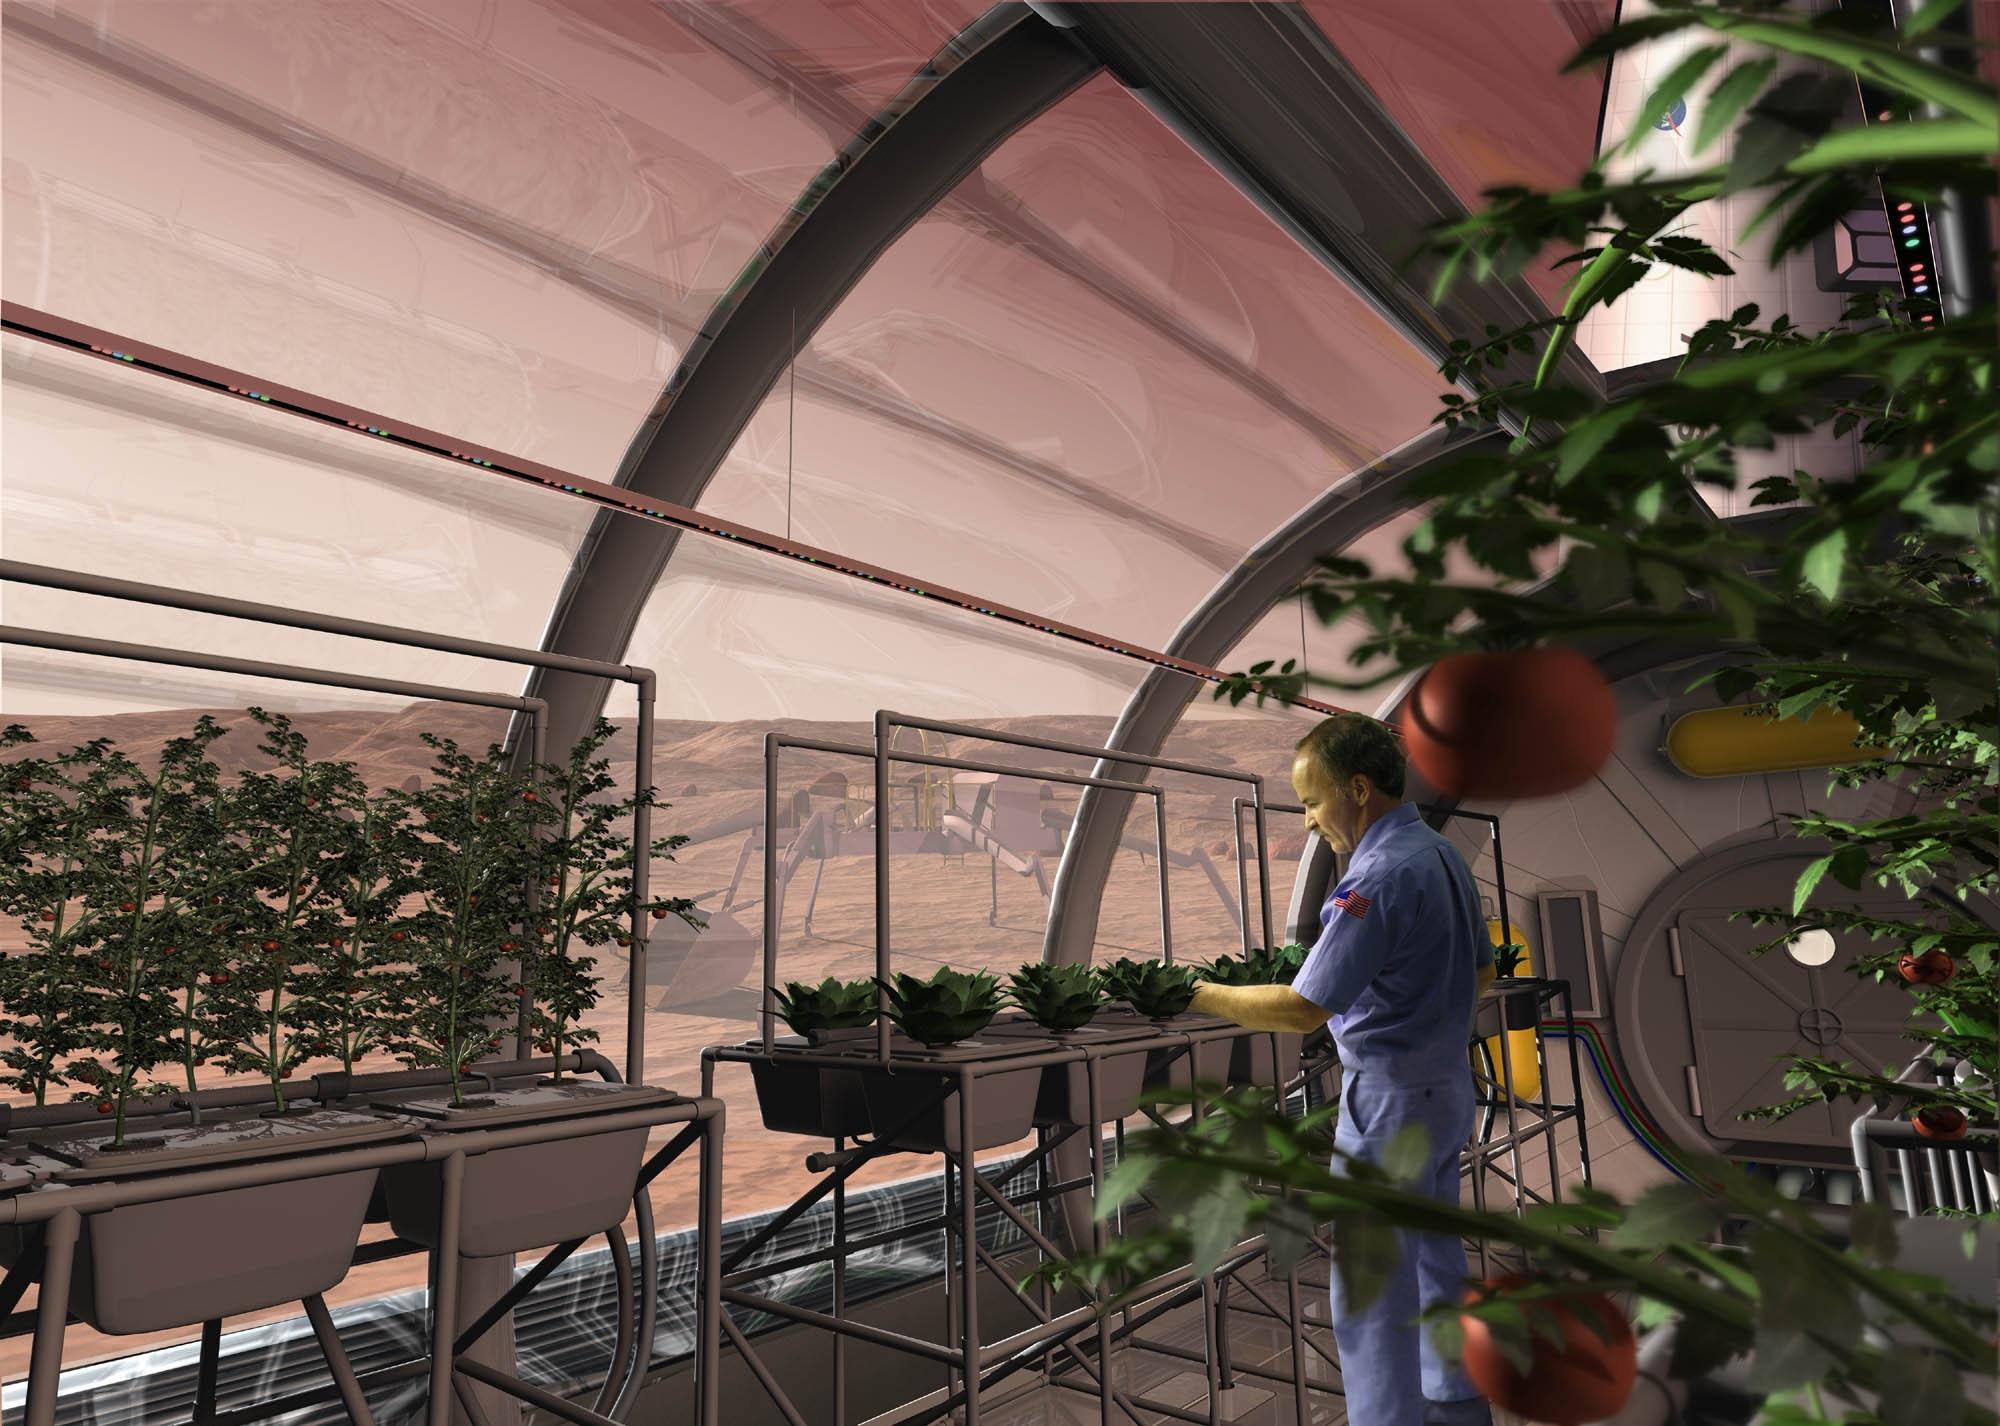 nasa plant researchers explore question of deep space food crops